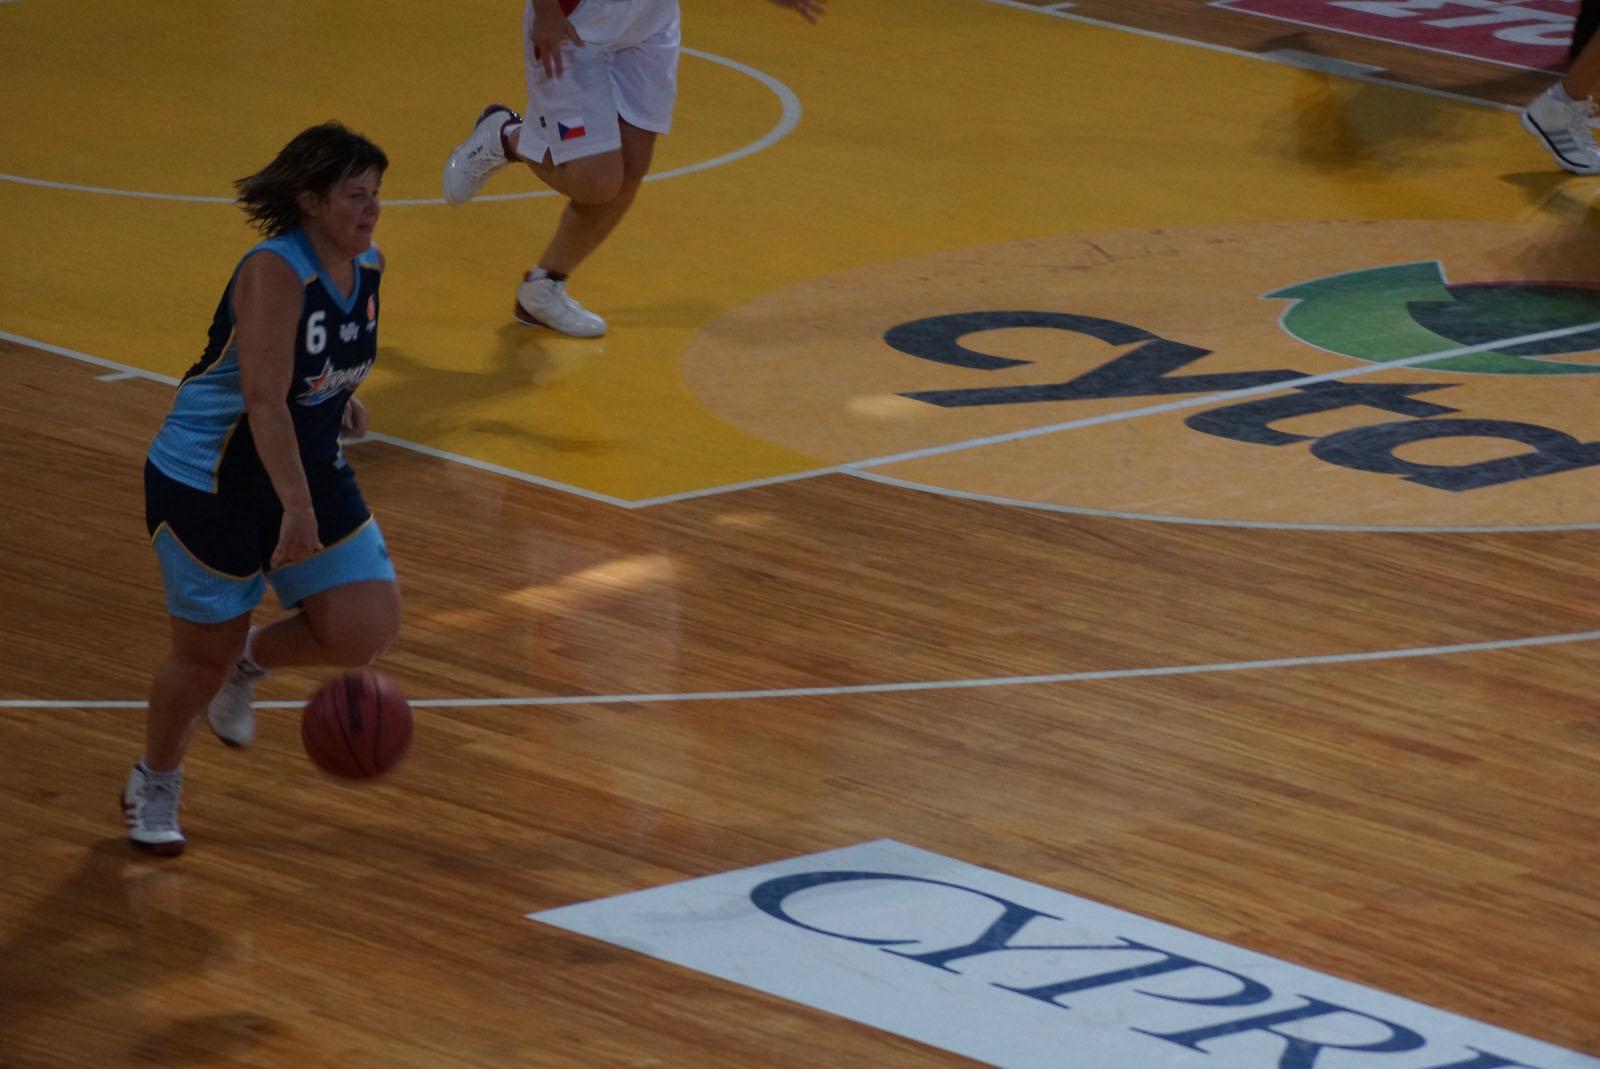 ALEXANDRION 1 | 50+F | KIWI PRAHA CZECH REPUBLIC A - ARGENTINA FFEMAR